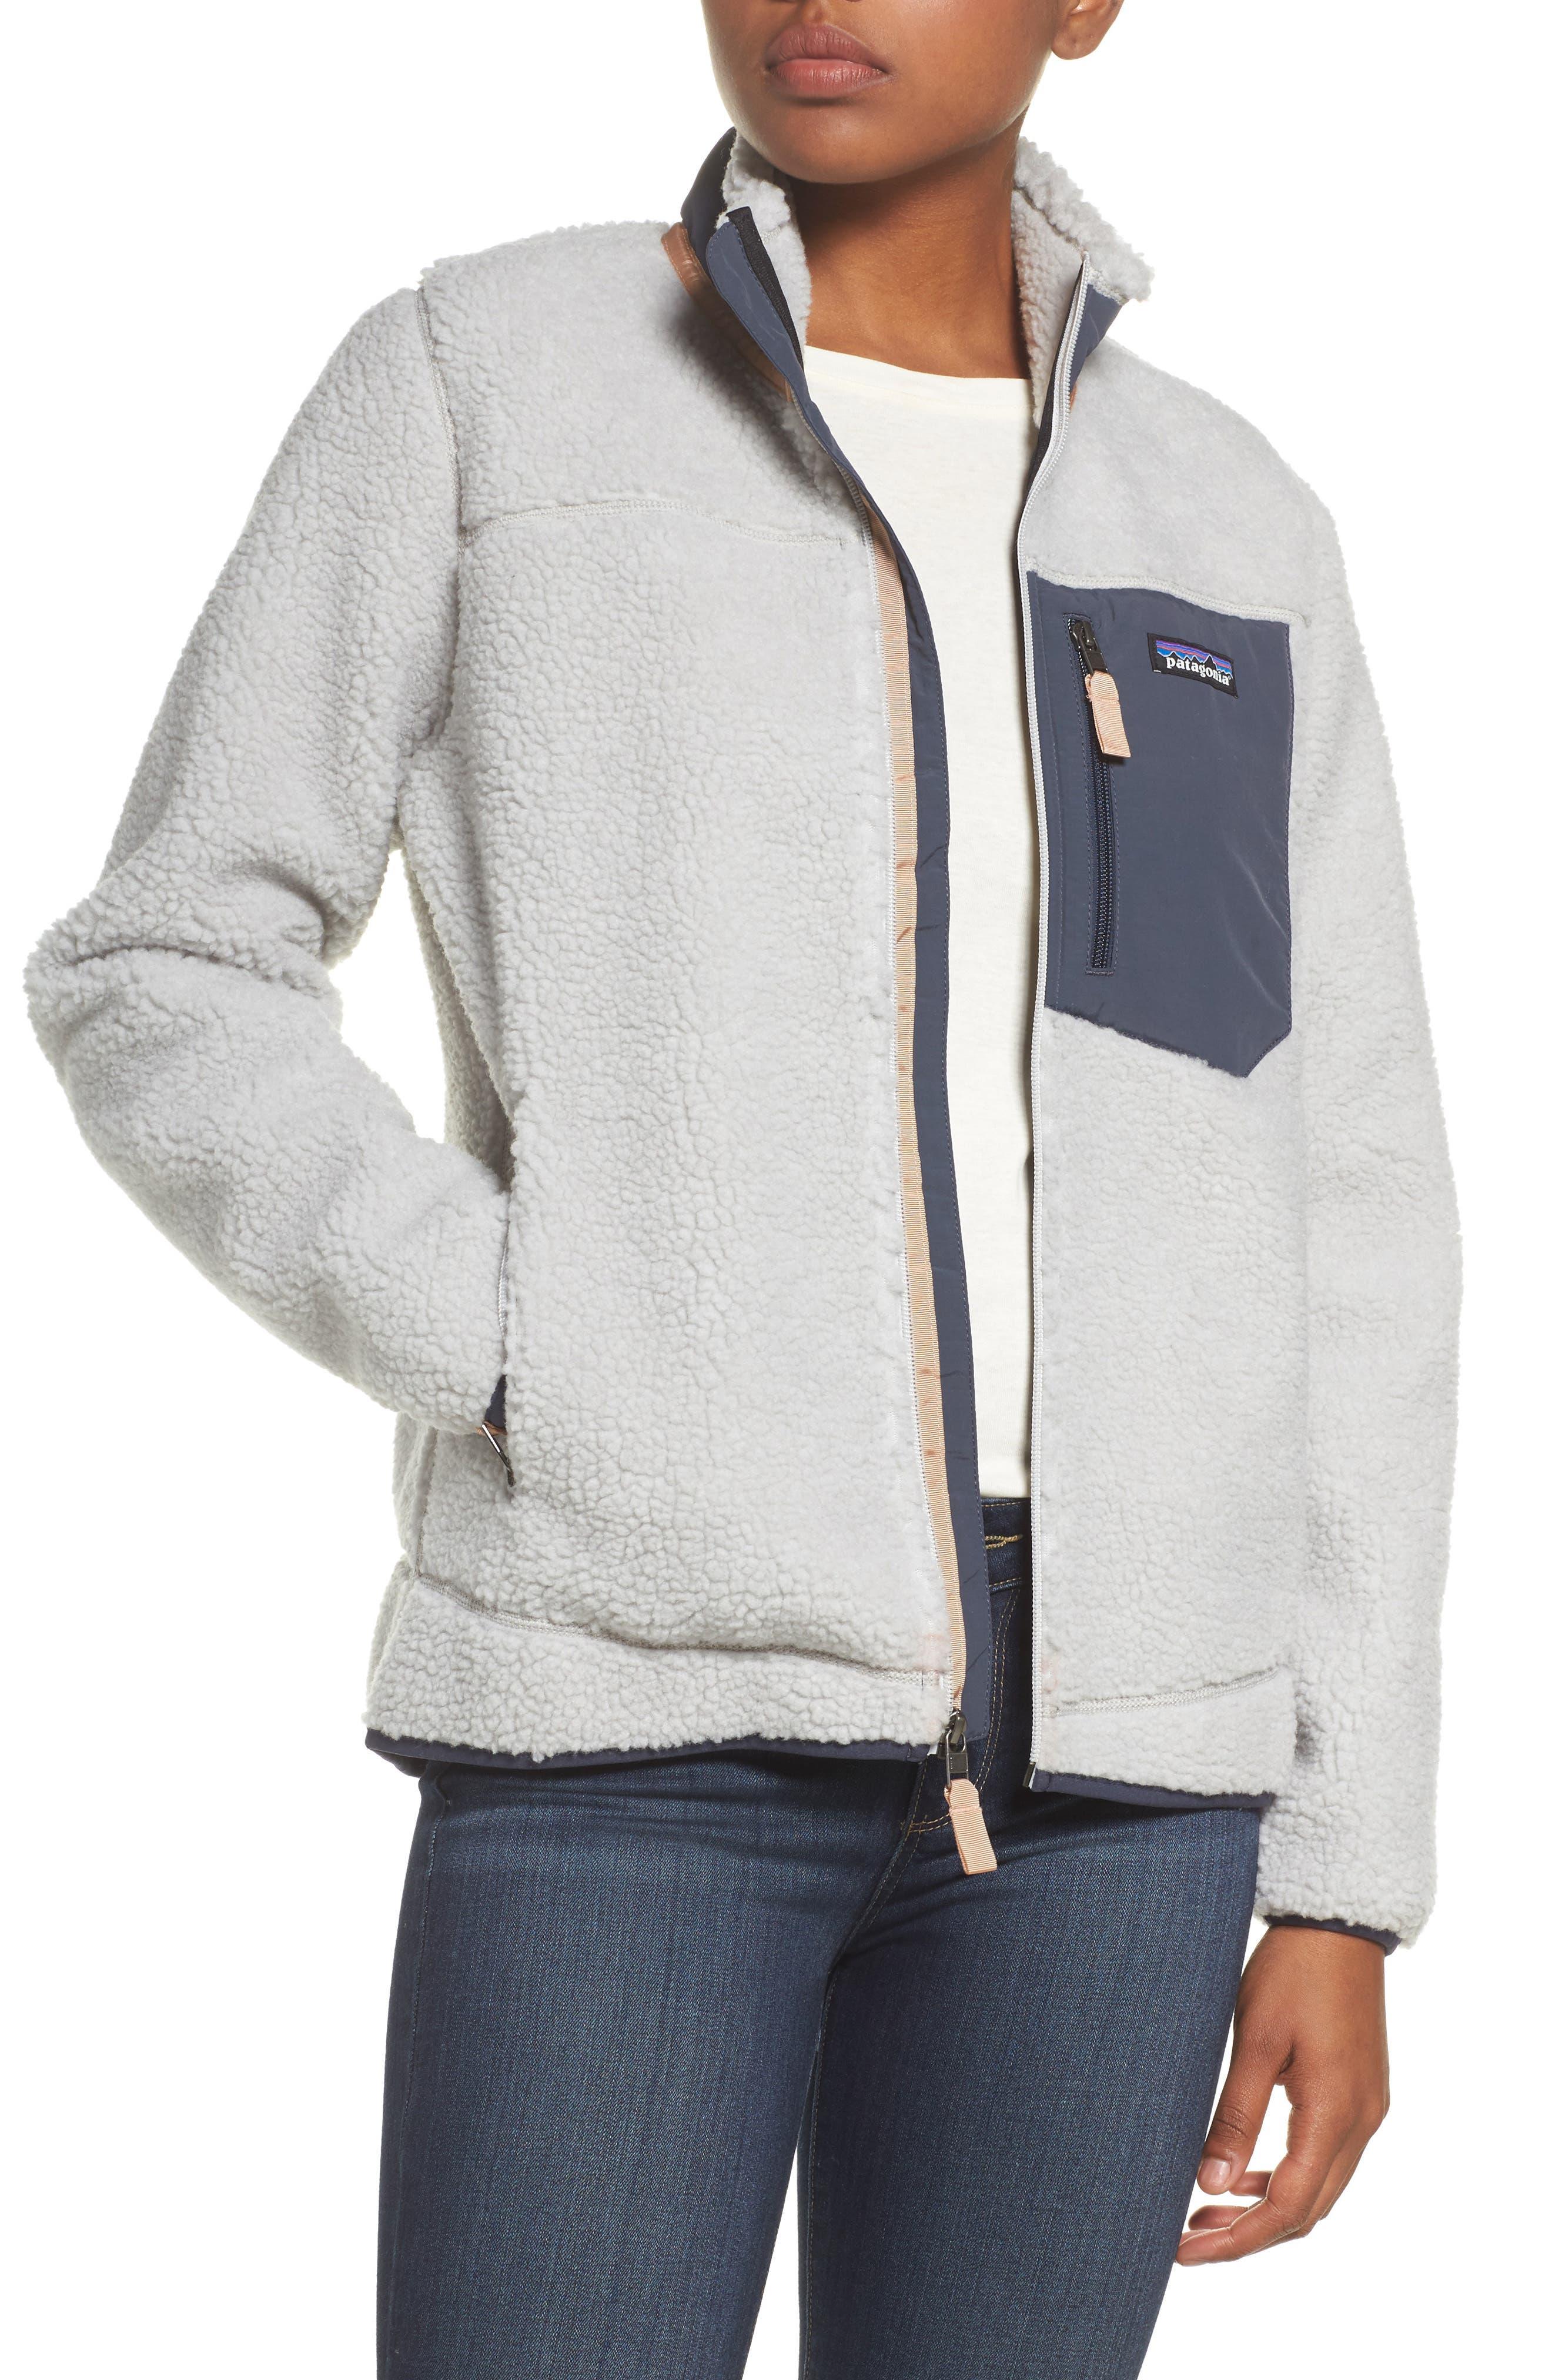 Classic Retro-X<sup>®</sup> Fleece Jacket,                         Main,                         color, Tailored Grey W/ Smolder Blue